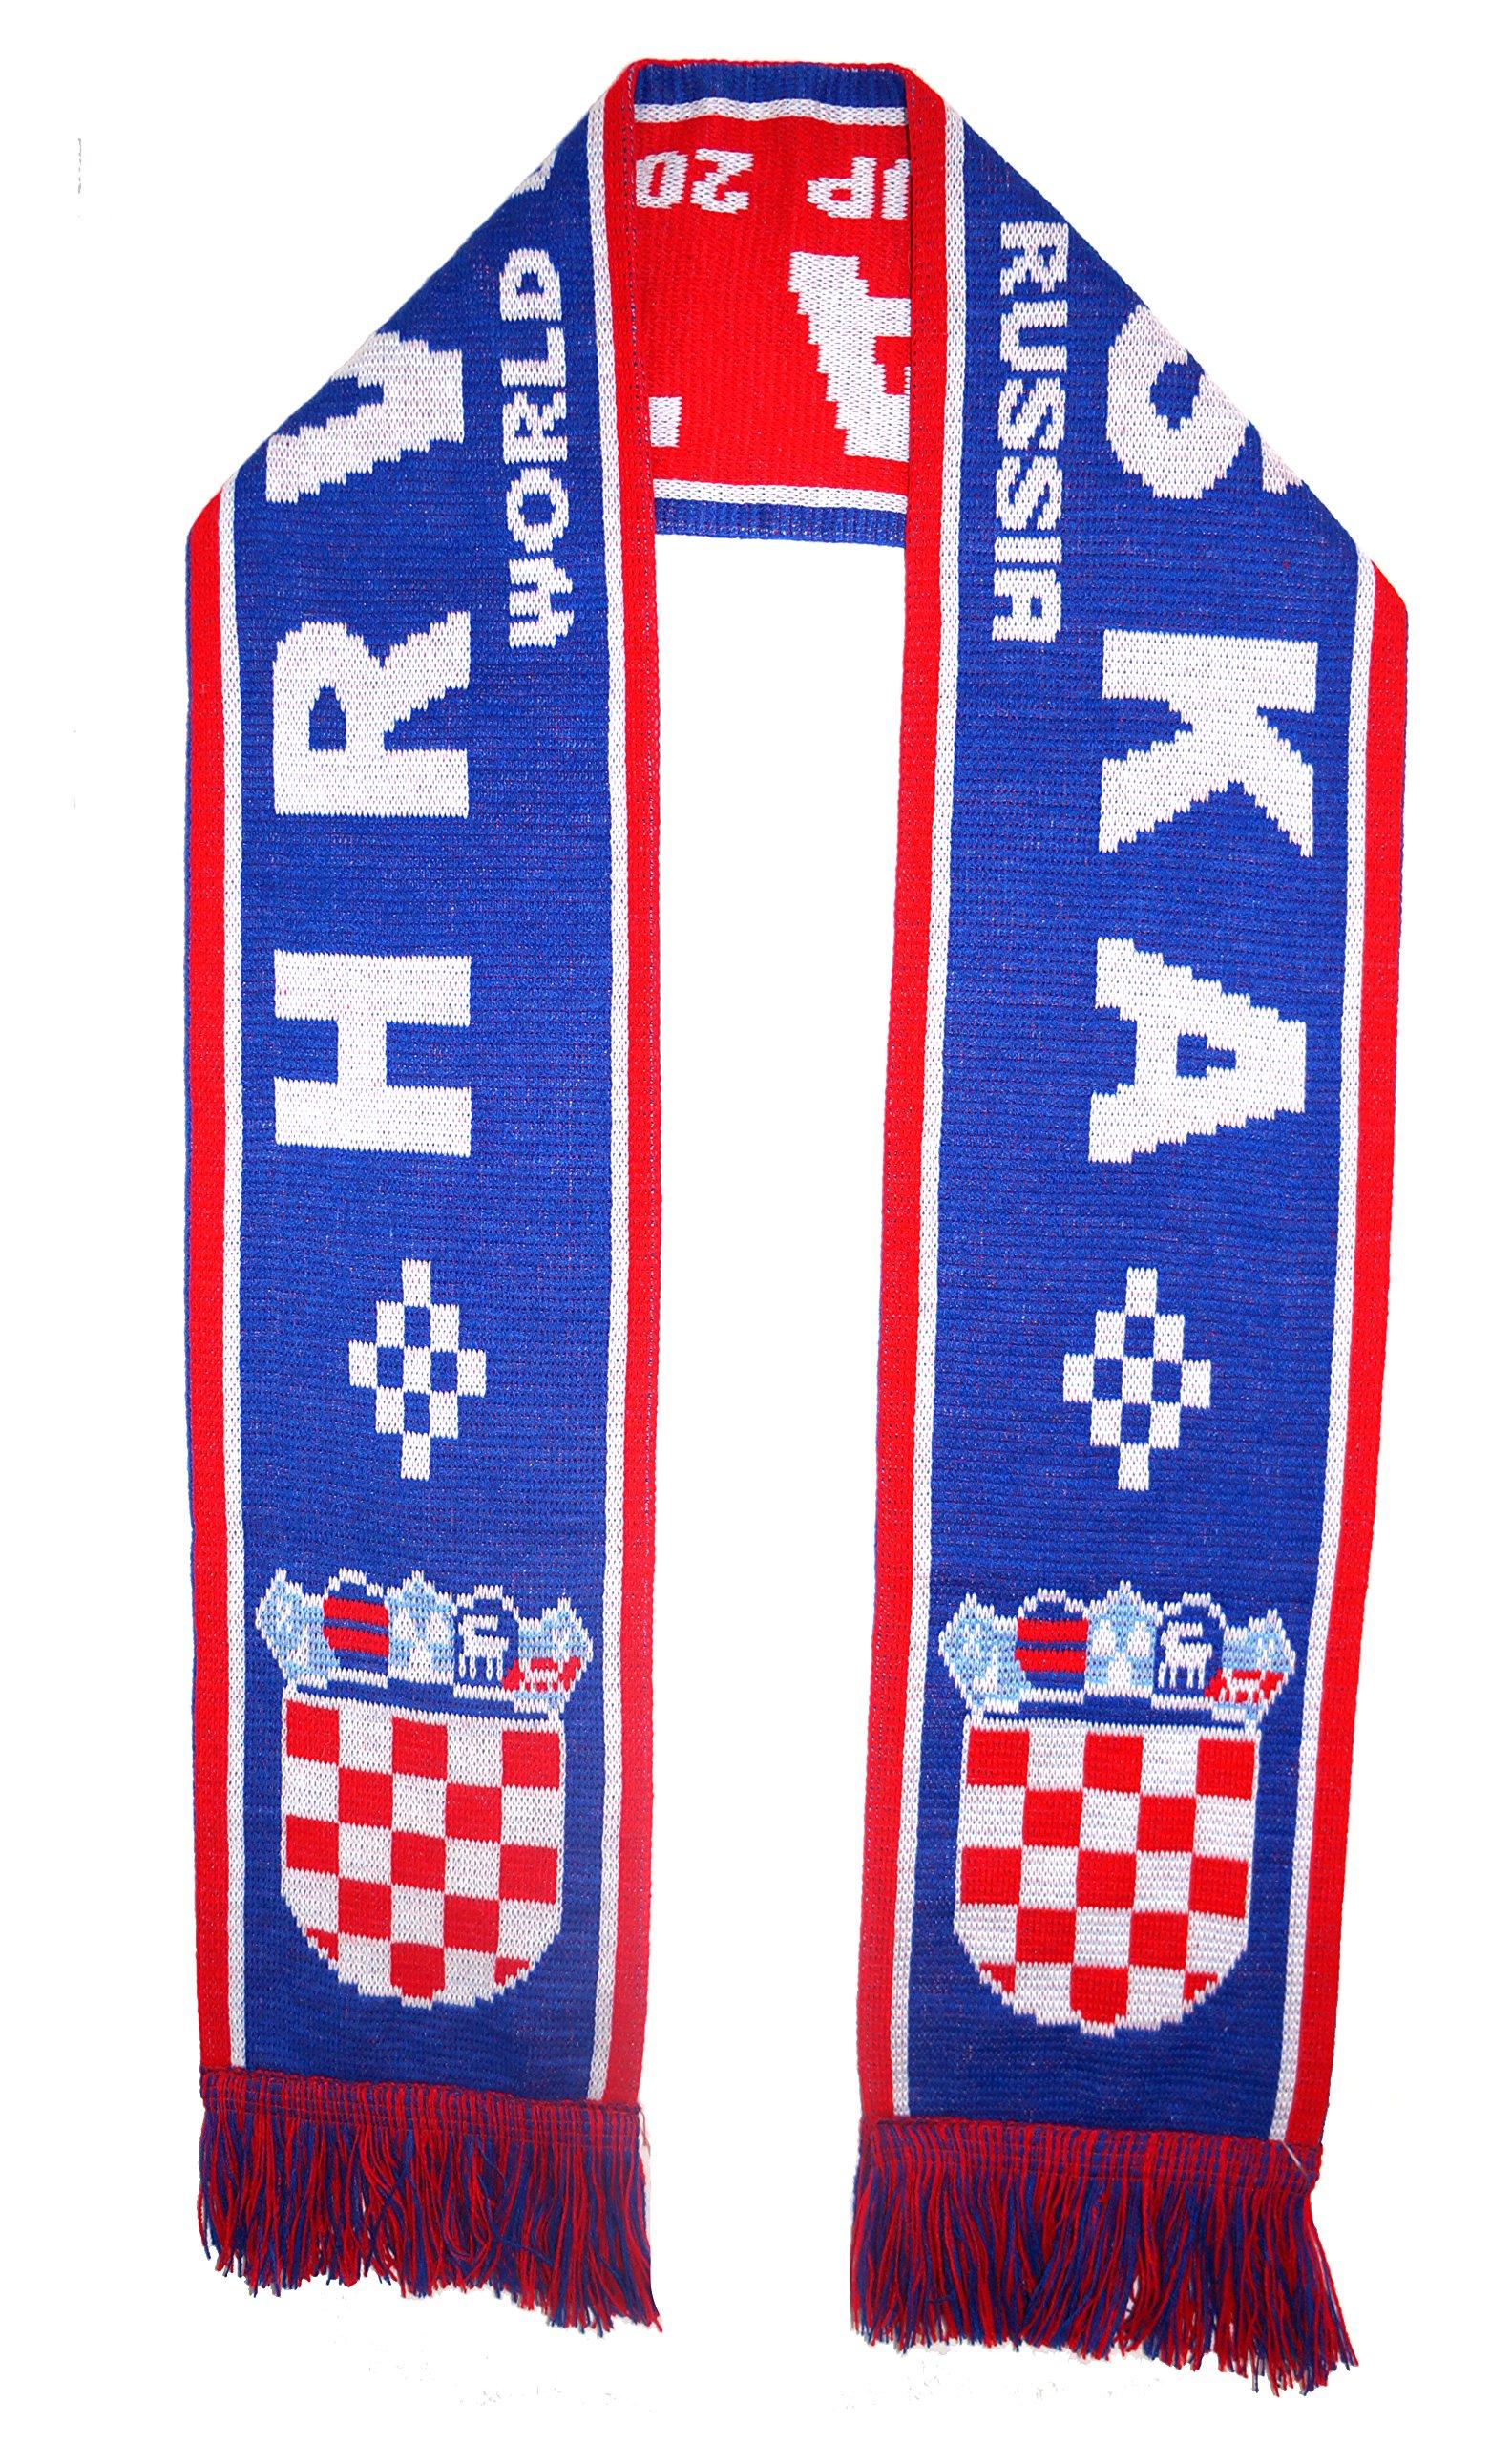 CROATIA 2018 World Cup Final Game Fans Favorite Scarf